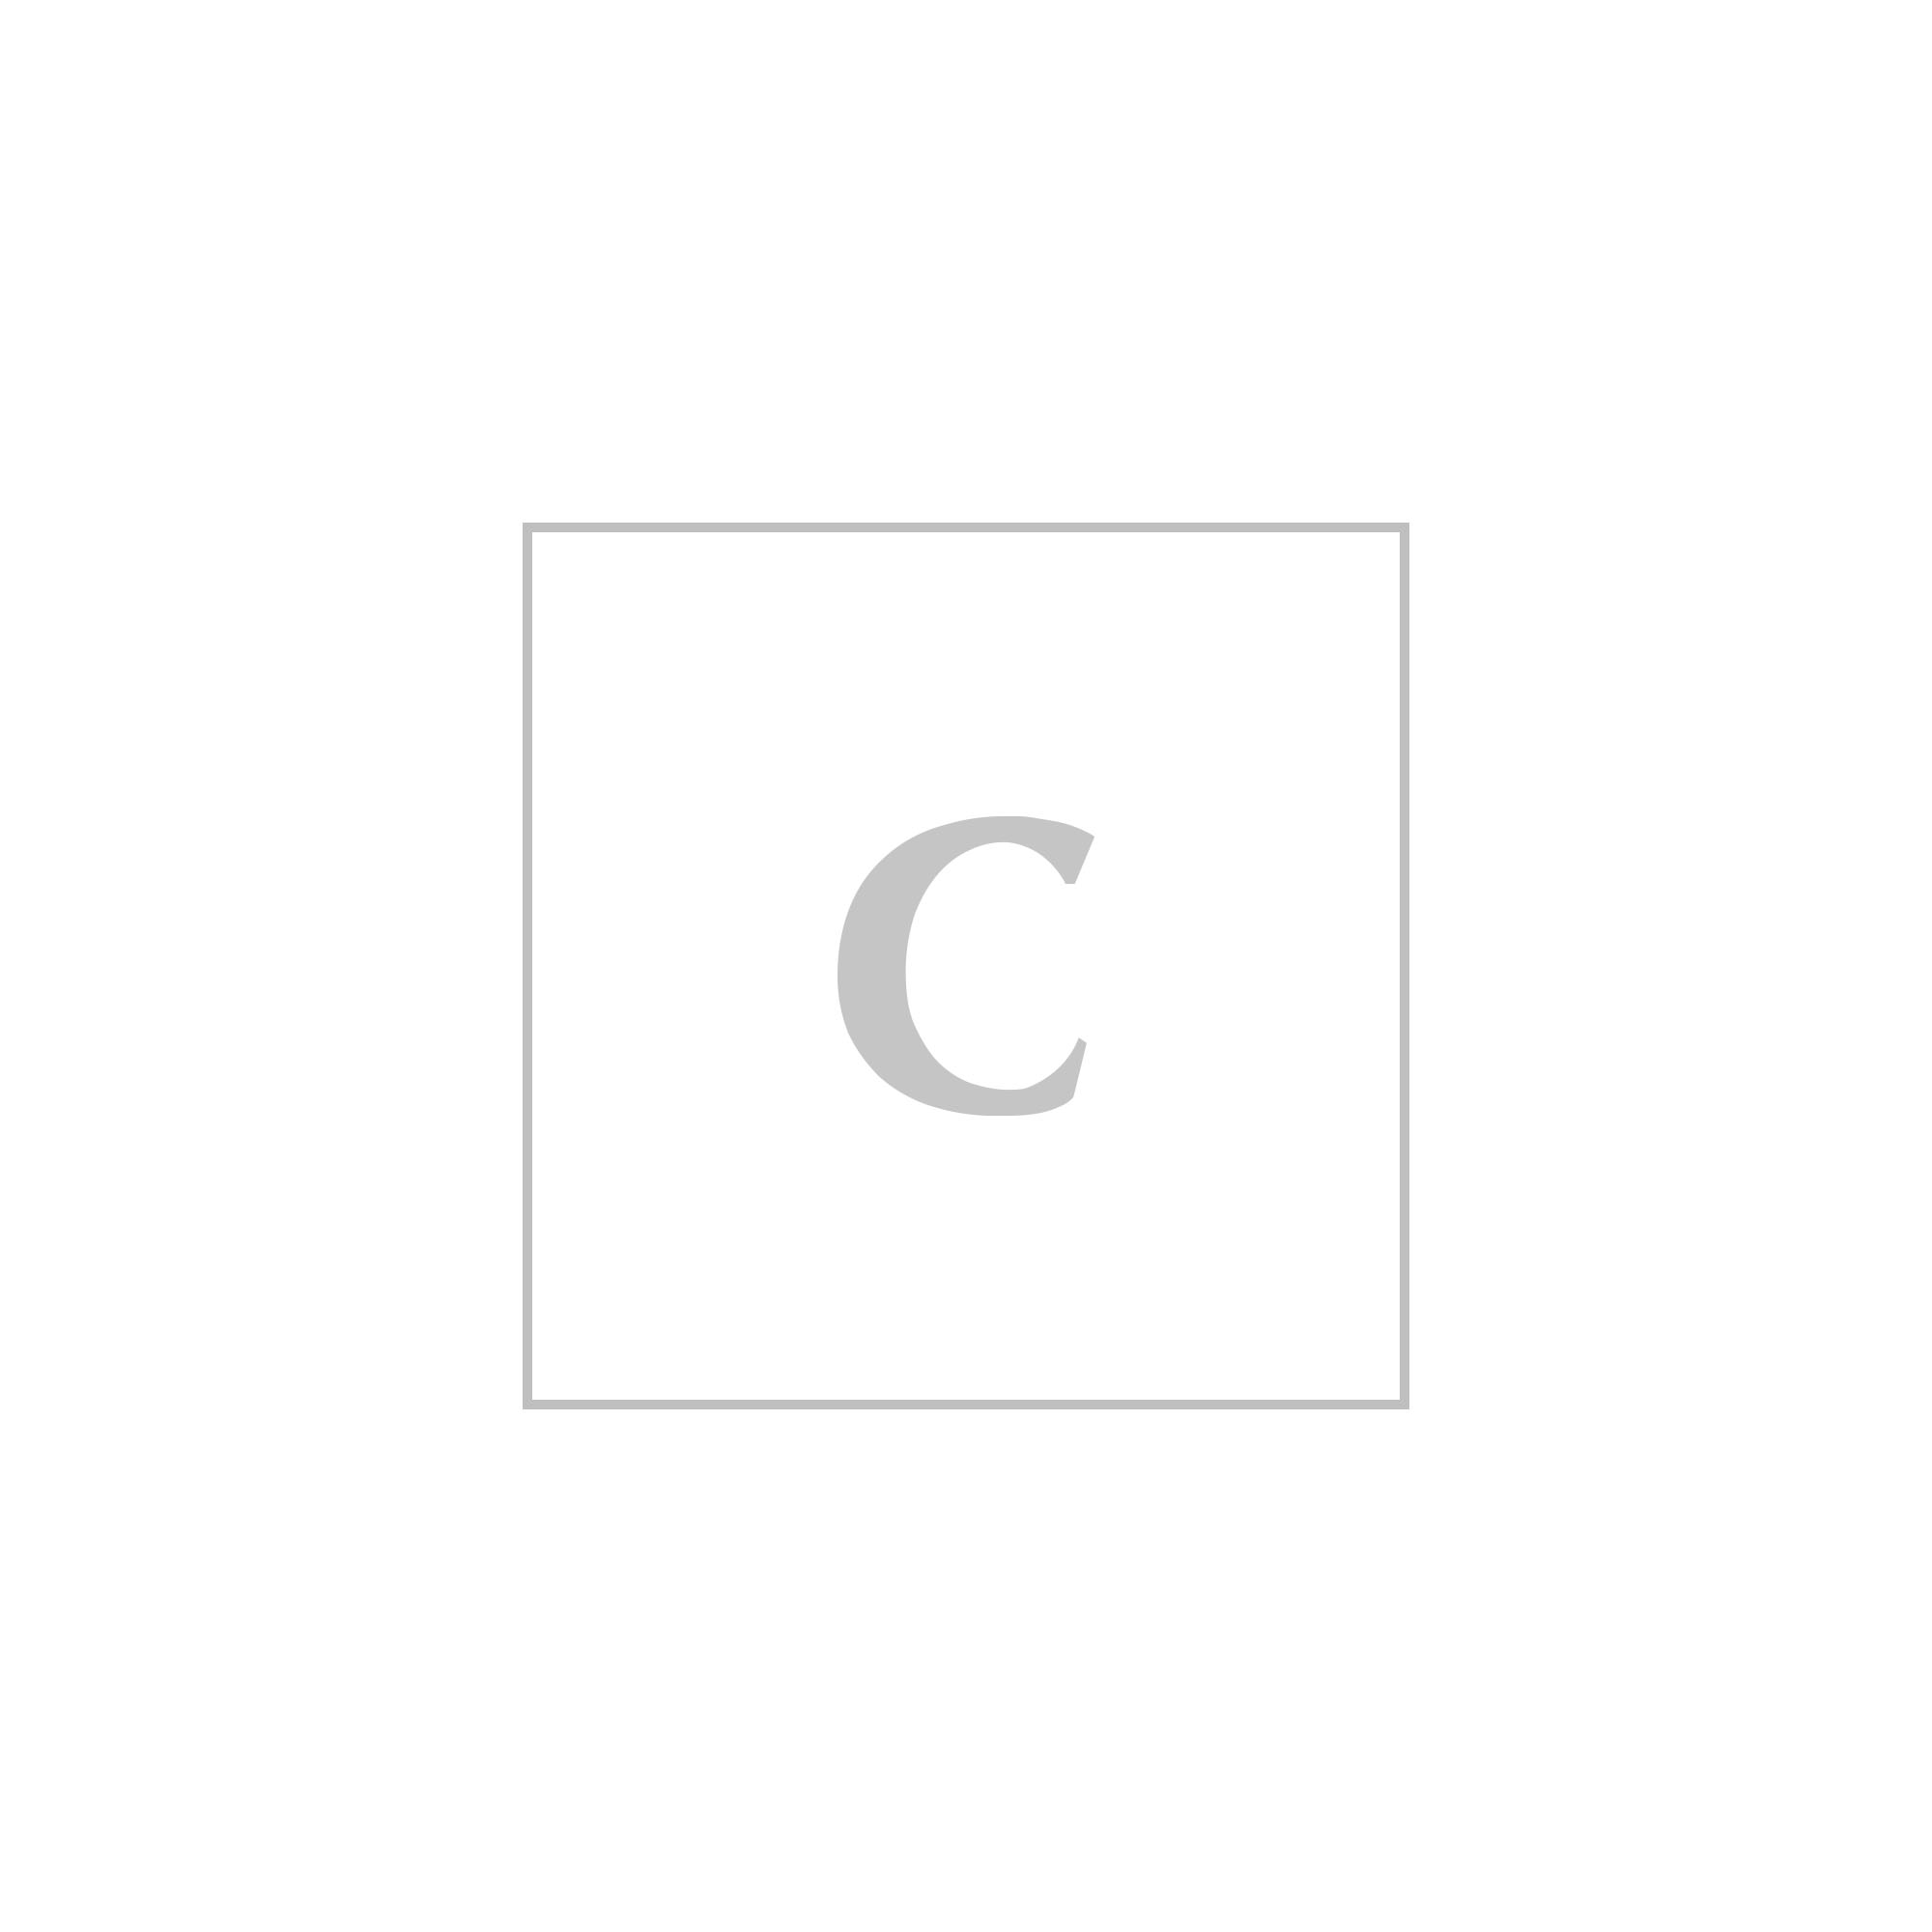 afe2074de Dolce & gabbana crown print jacket